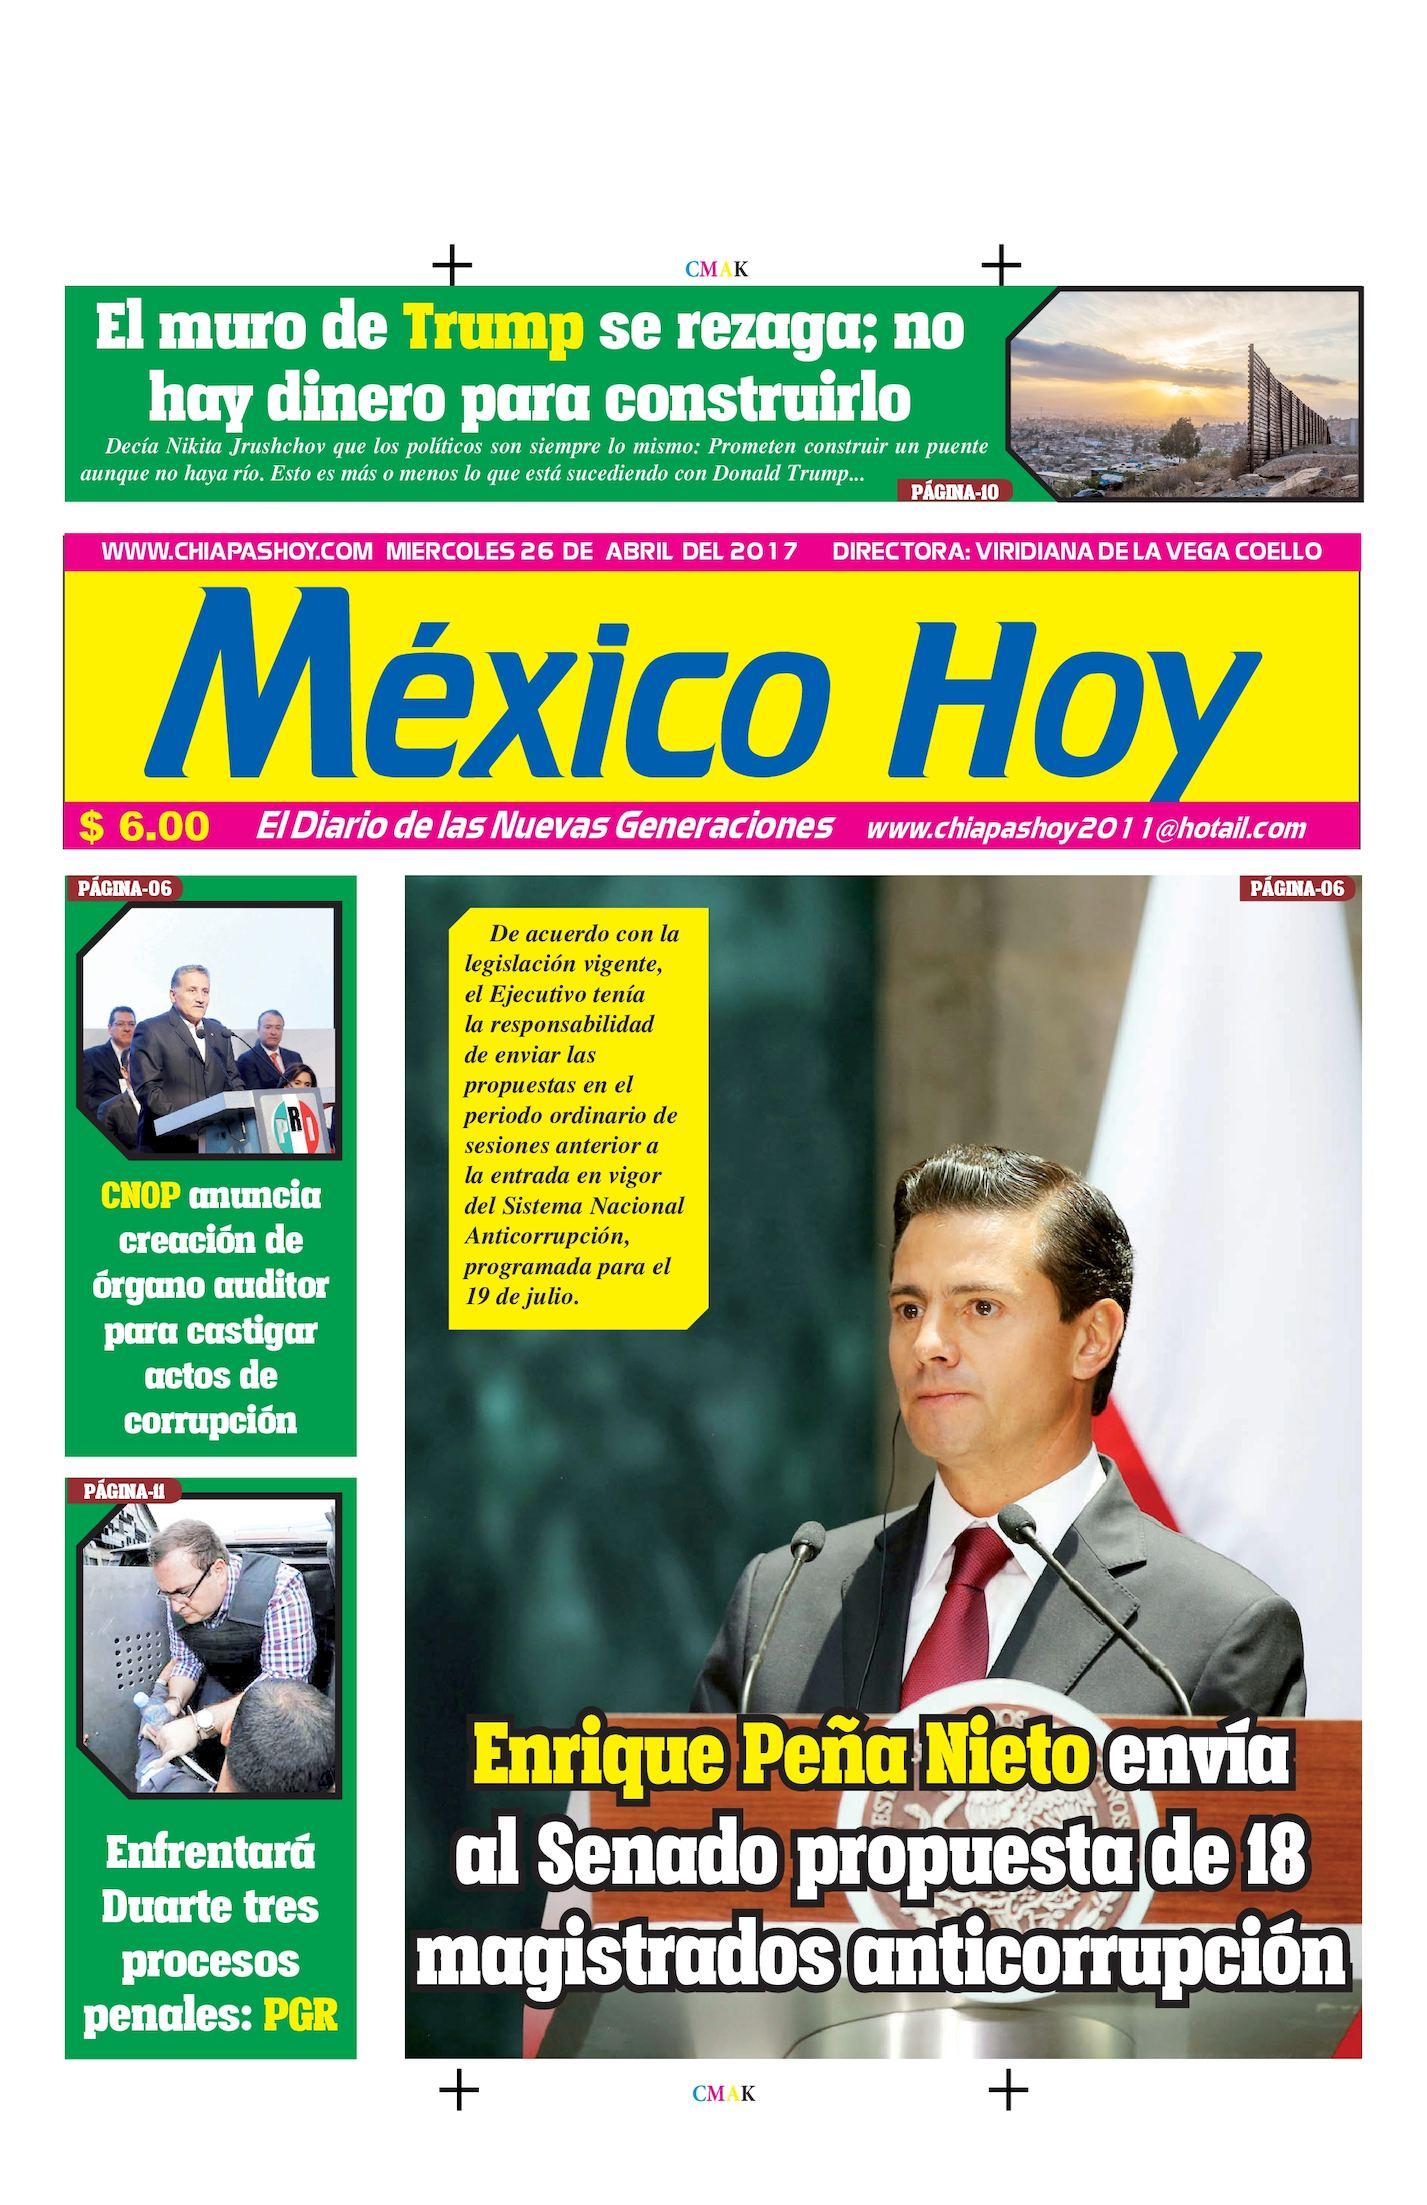 MEXICO HOY 26 DE ABRIL